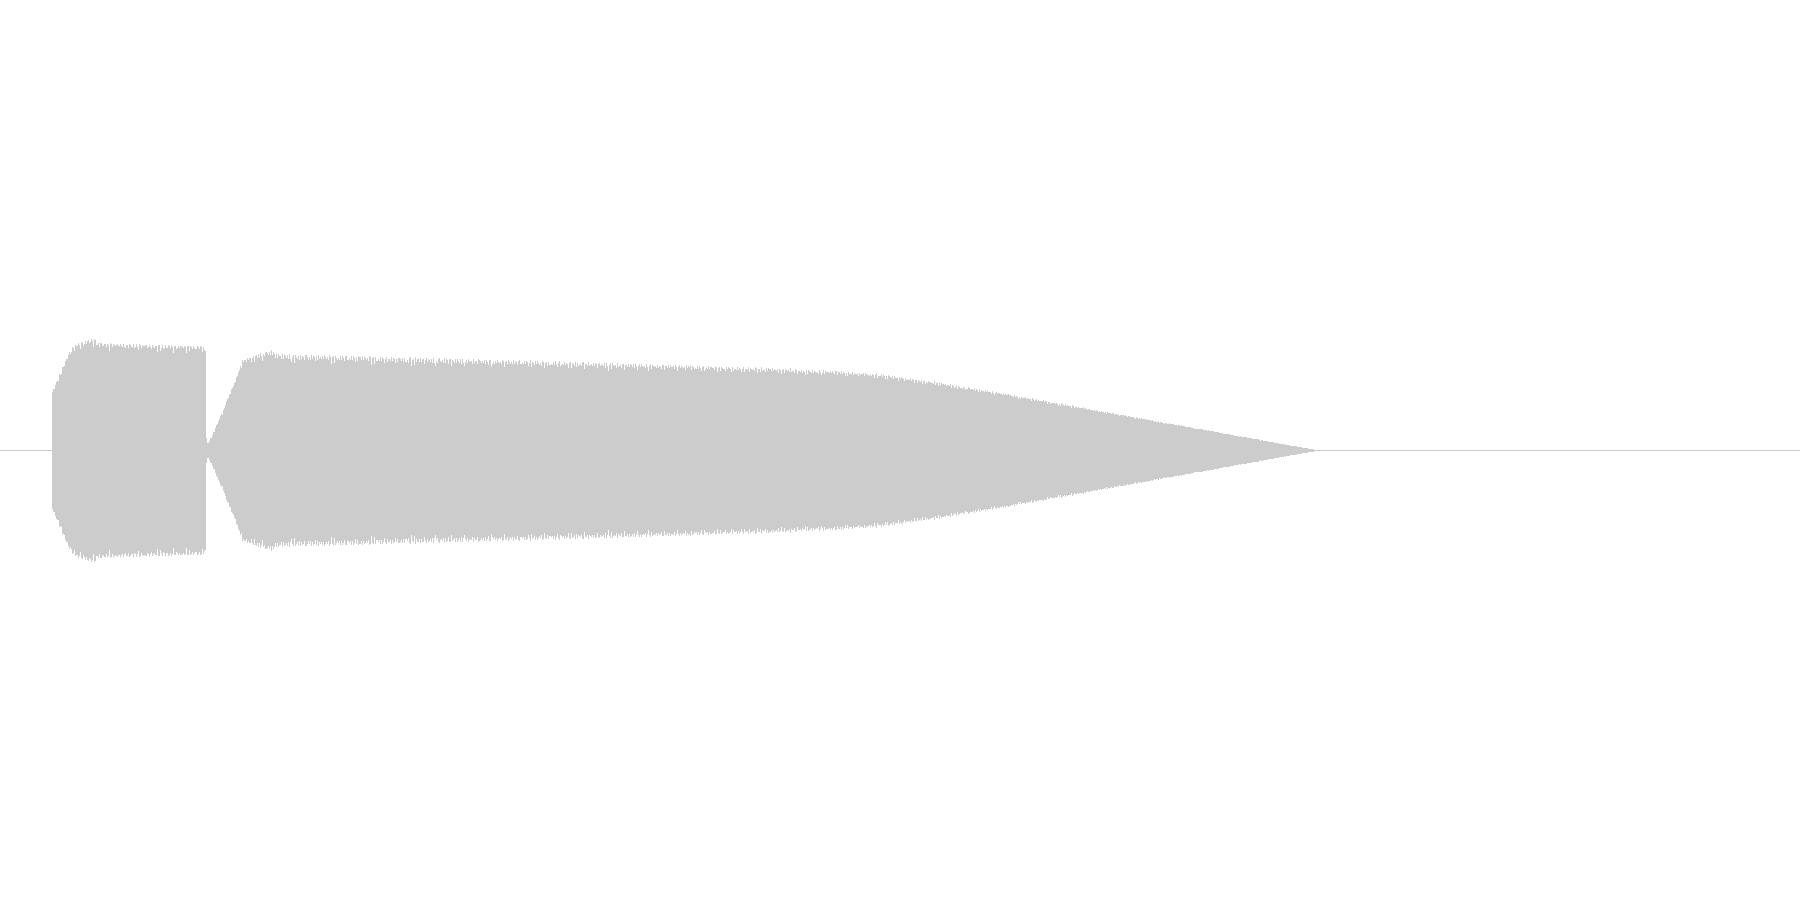 8bitの氷魔法1 ピキーンの未再生の波形